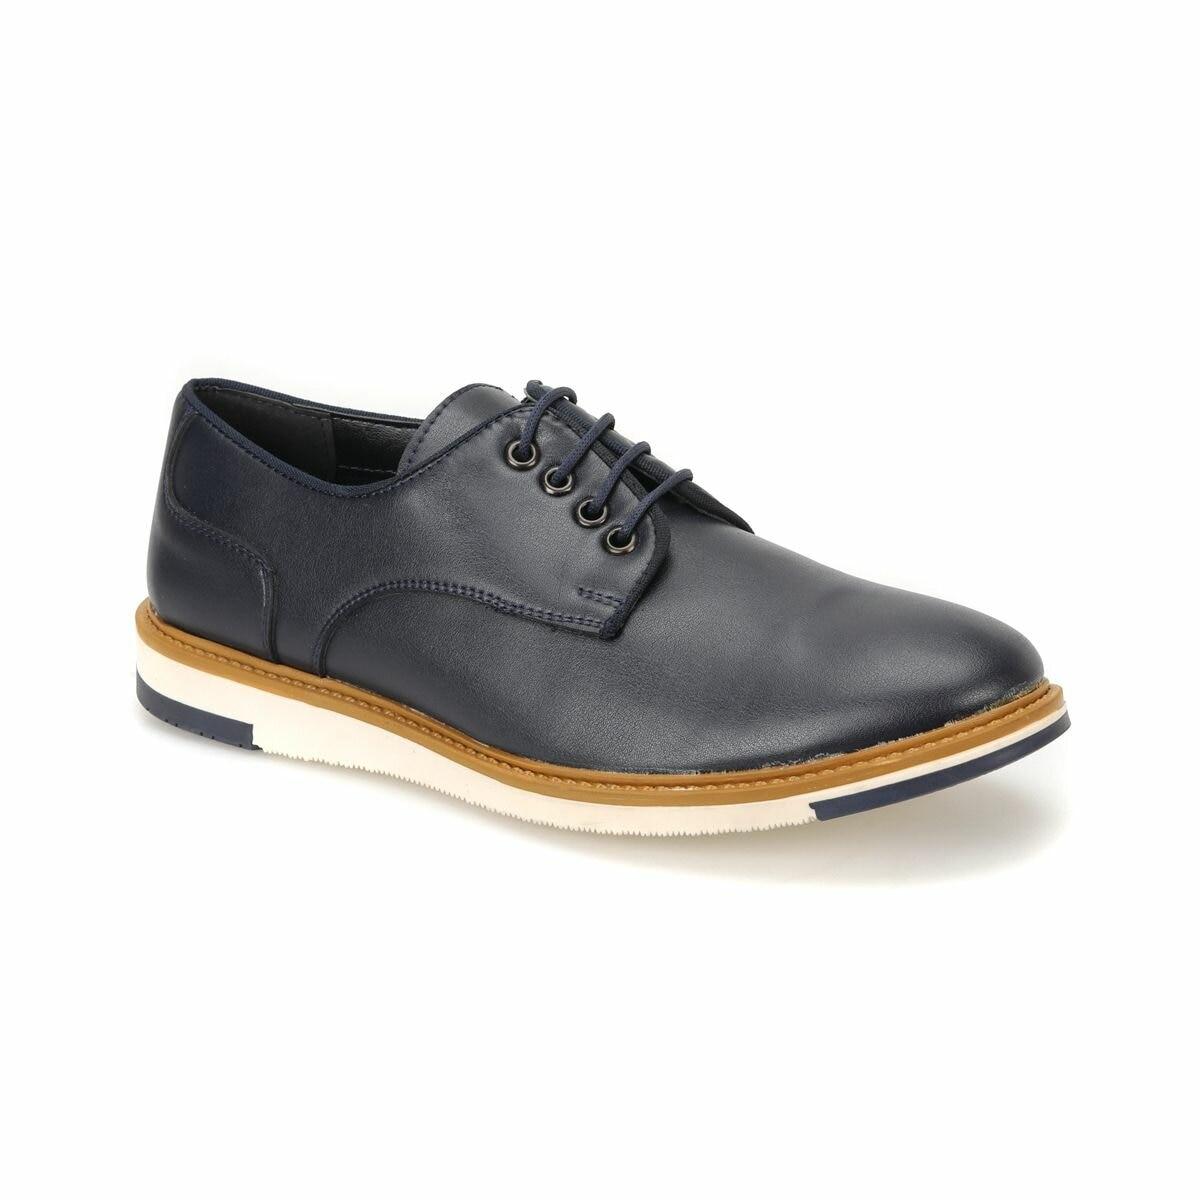 FLO 51066-1 Navy Blue Men 'S Classic Shoes JJ-Stiller